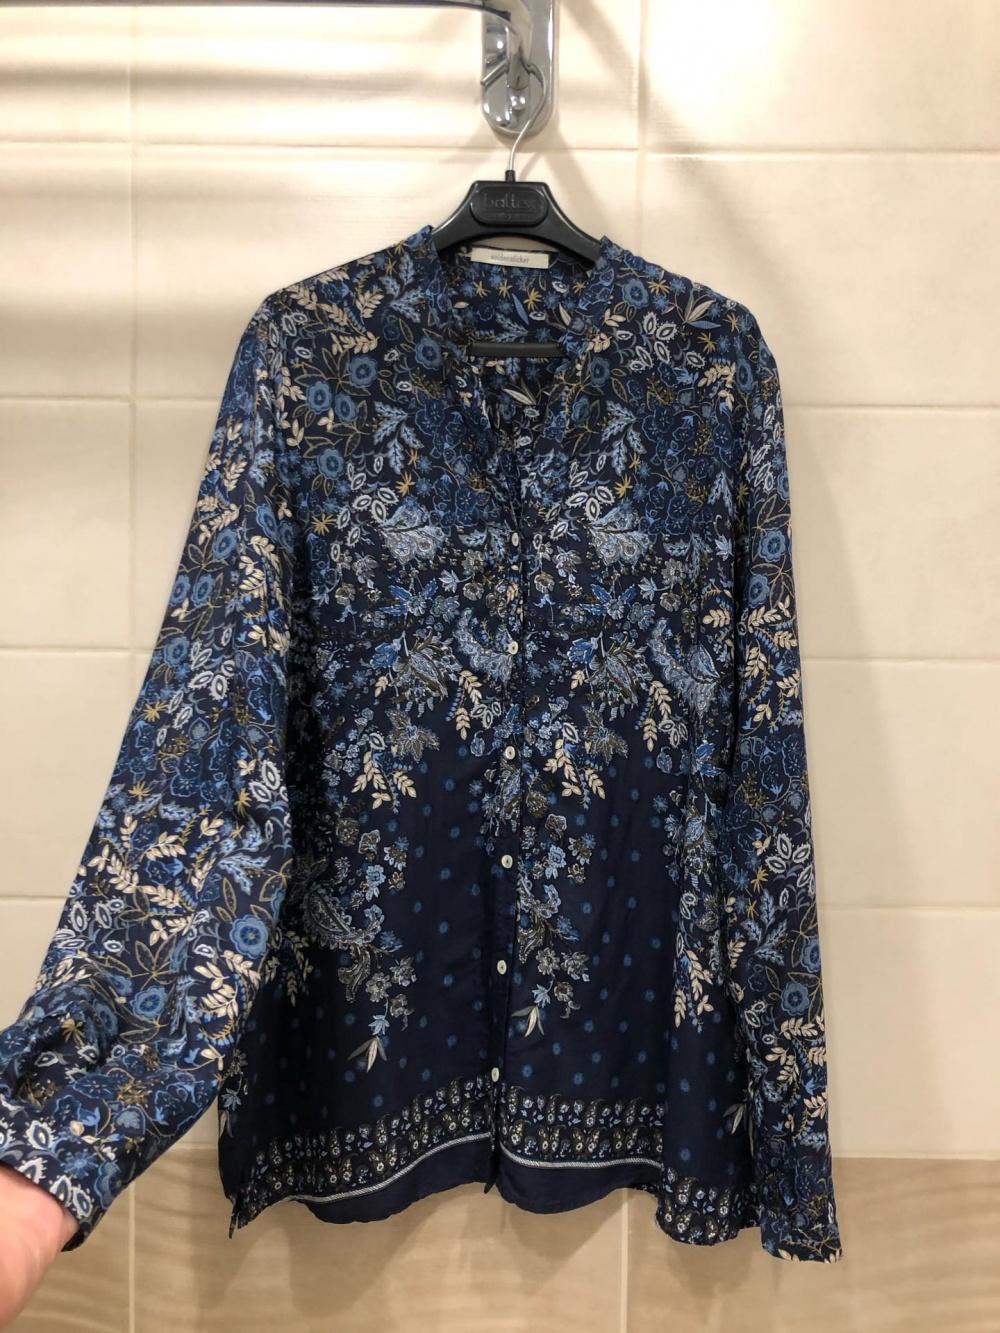 Блузка SEIDENSTICKER. Размер 50-52.